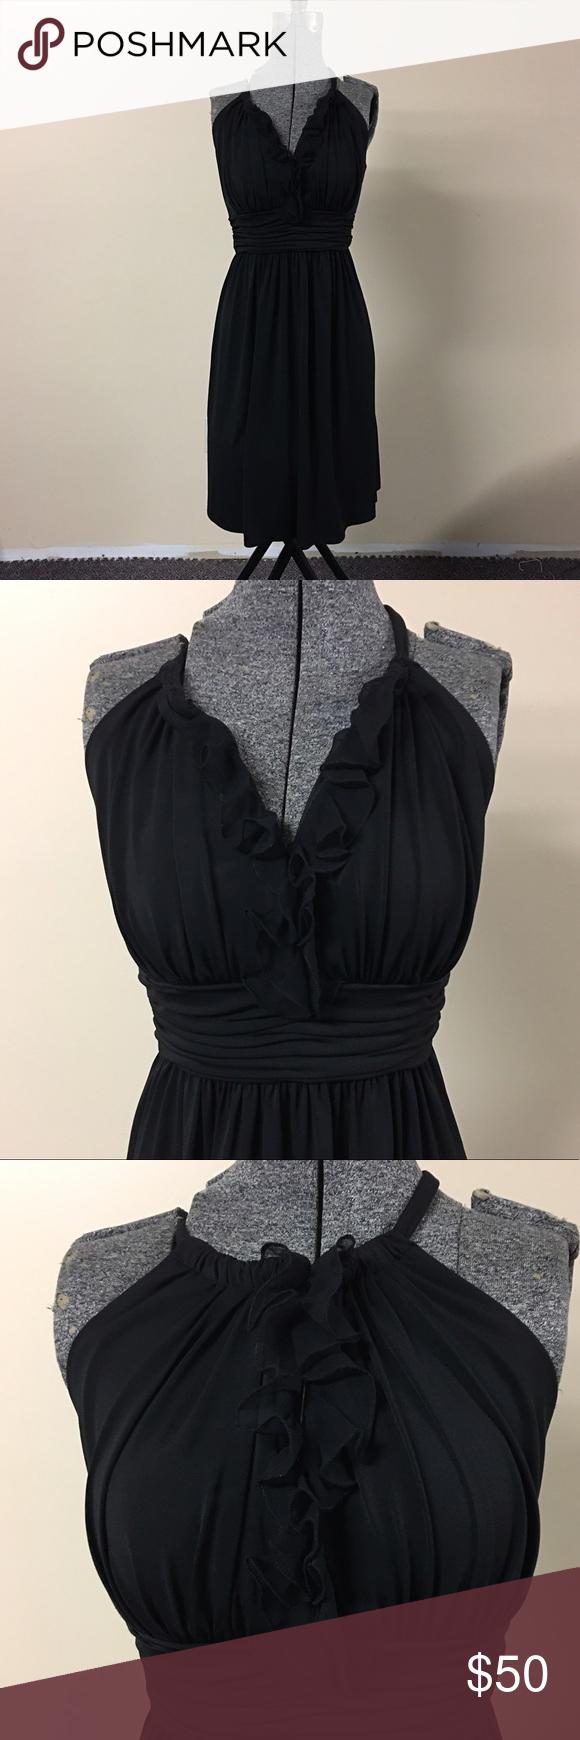 Black ruffle dress suzi chin maggie boutique nwot black ruffle